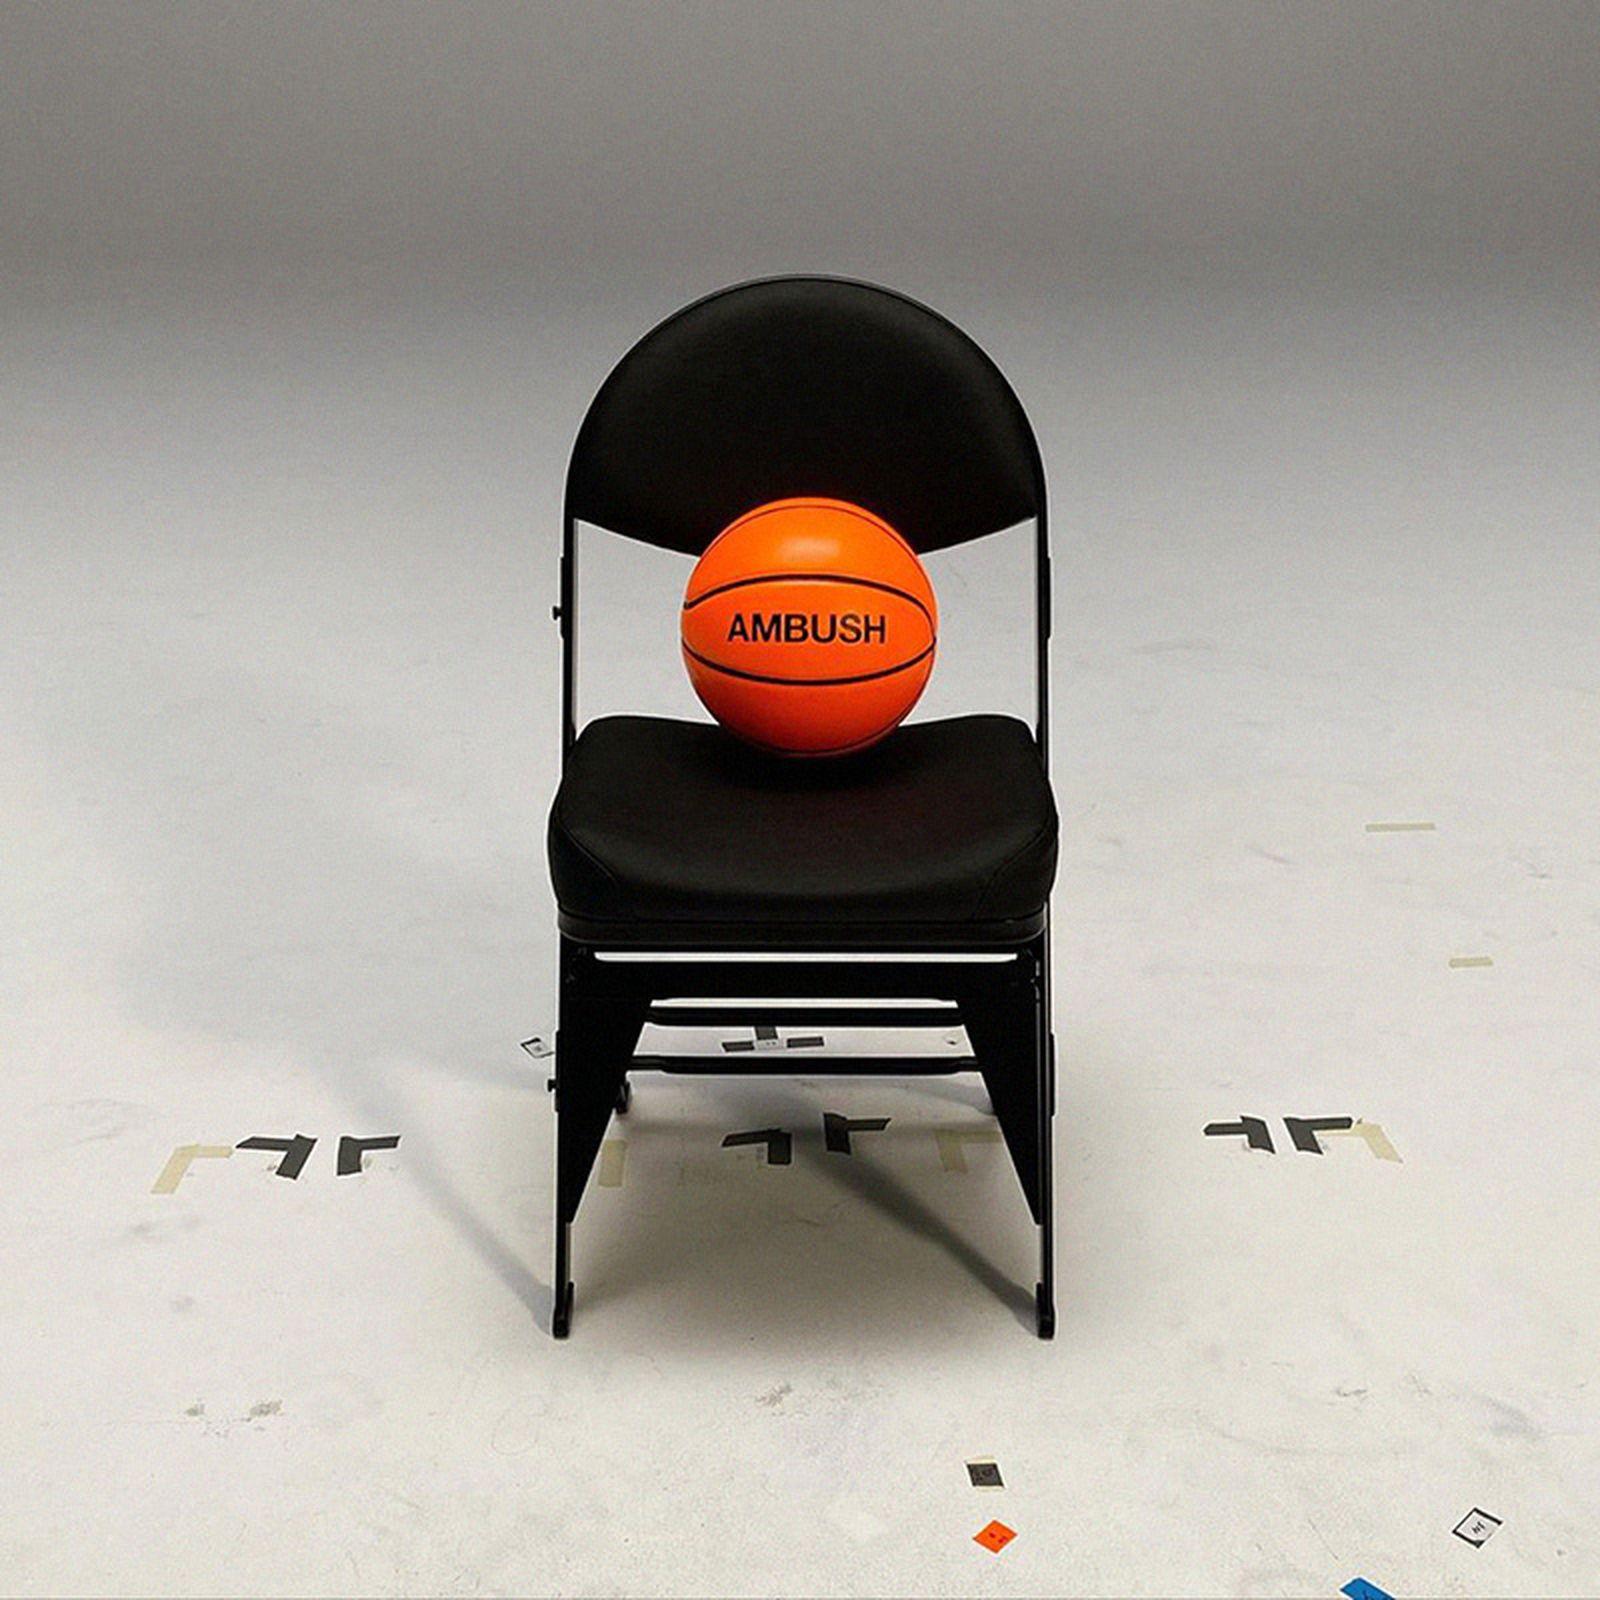 nike-x-nba-x-ambush-basketball-collection-02